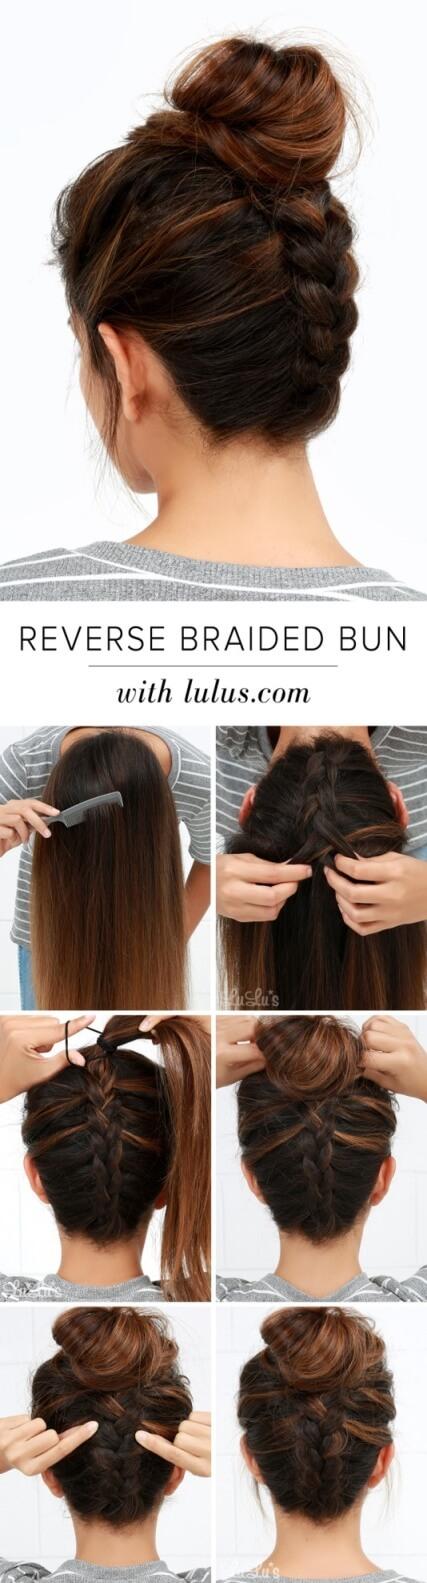 Reverse Braided Bun